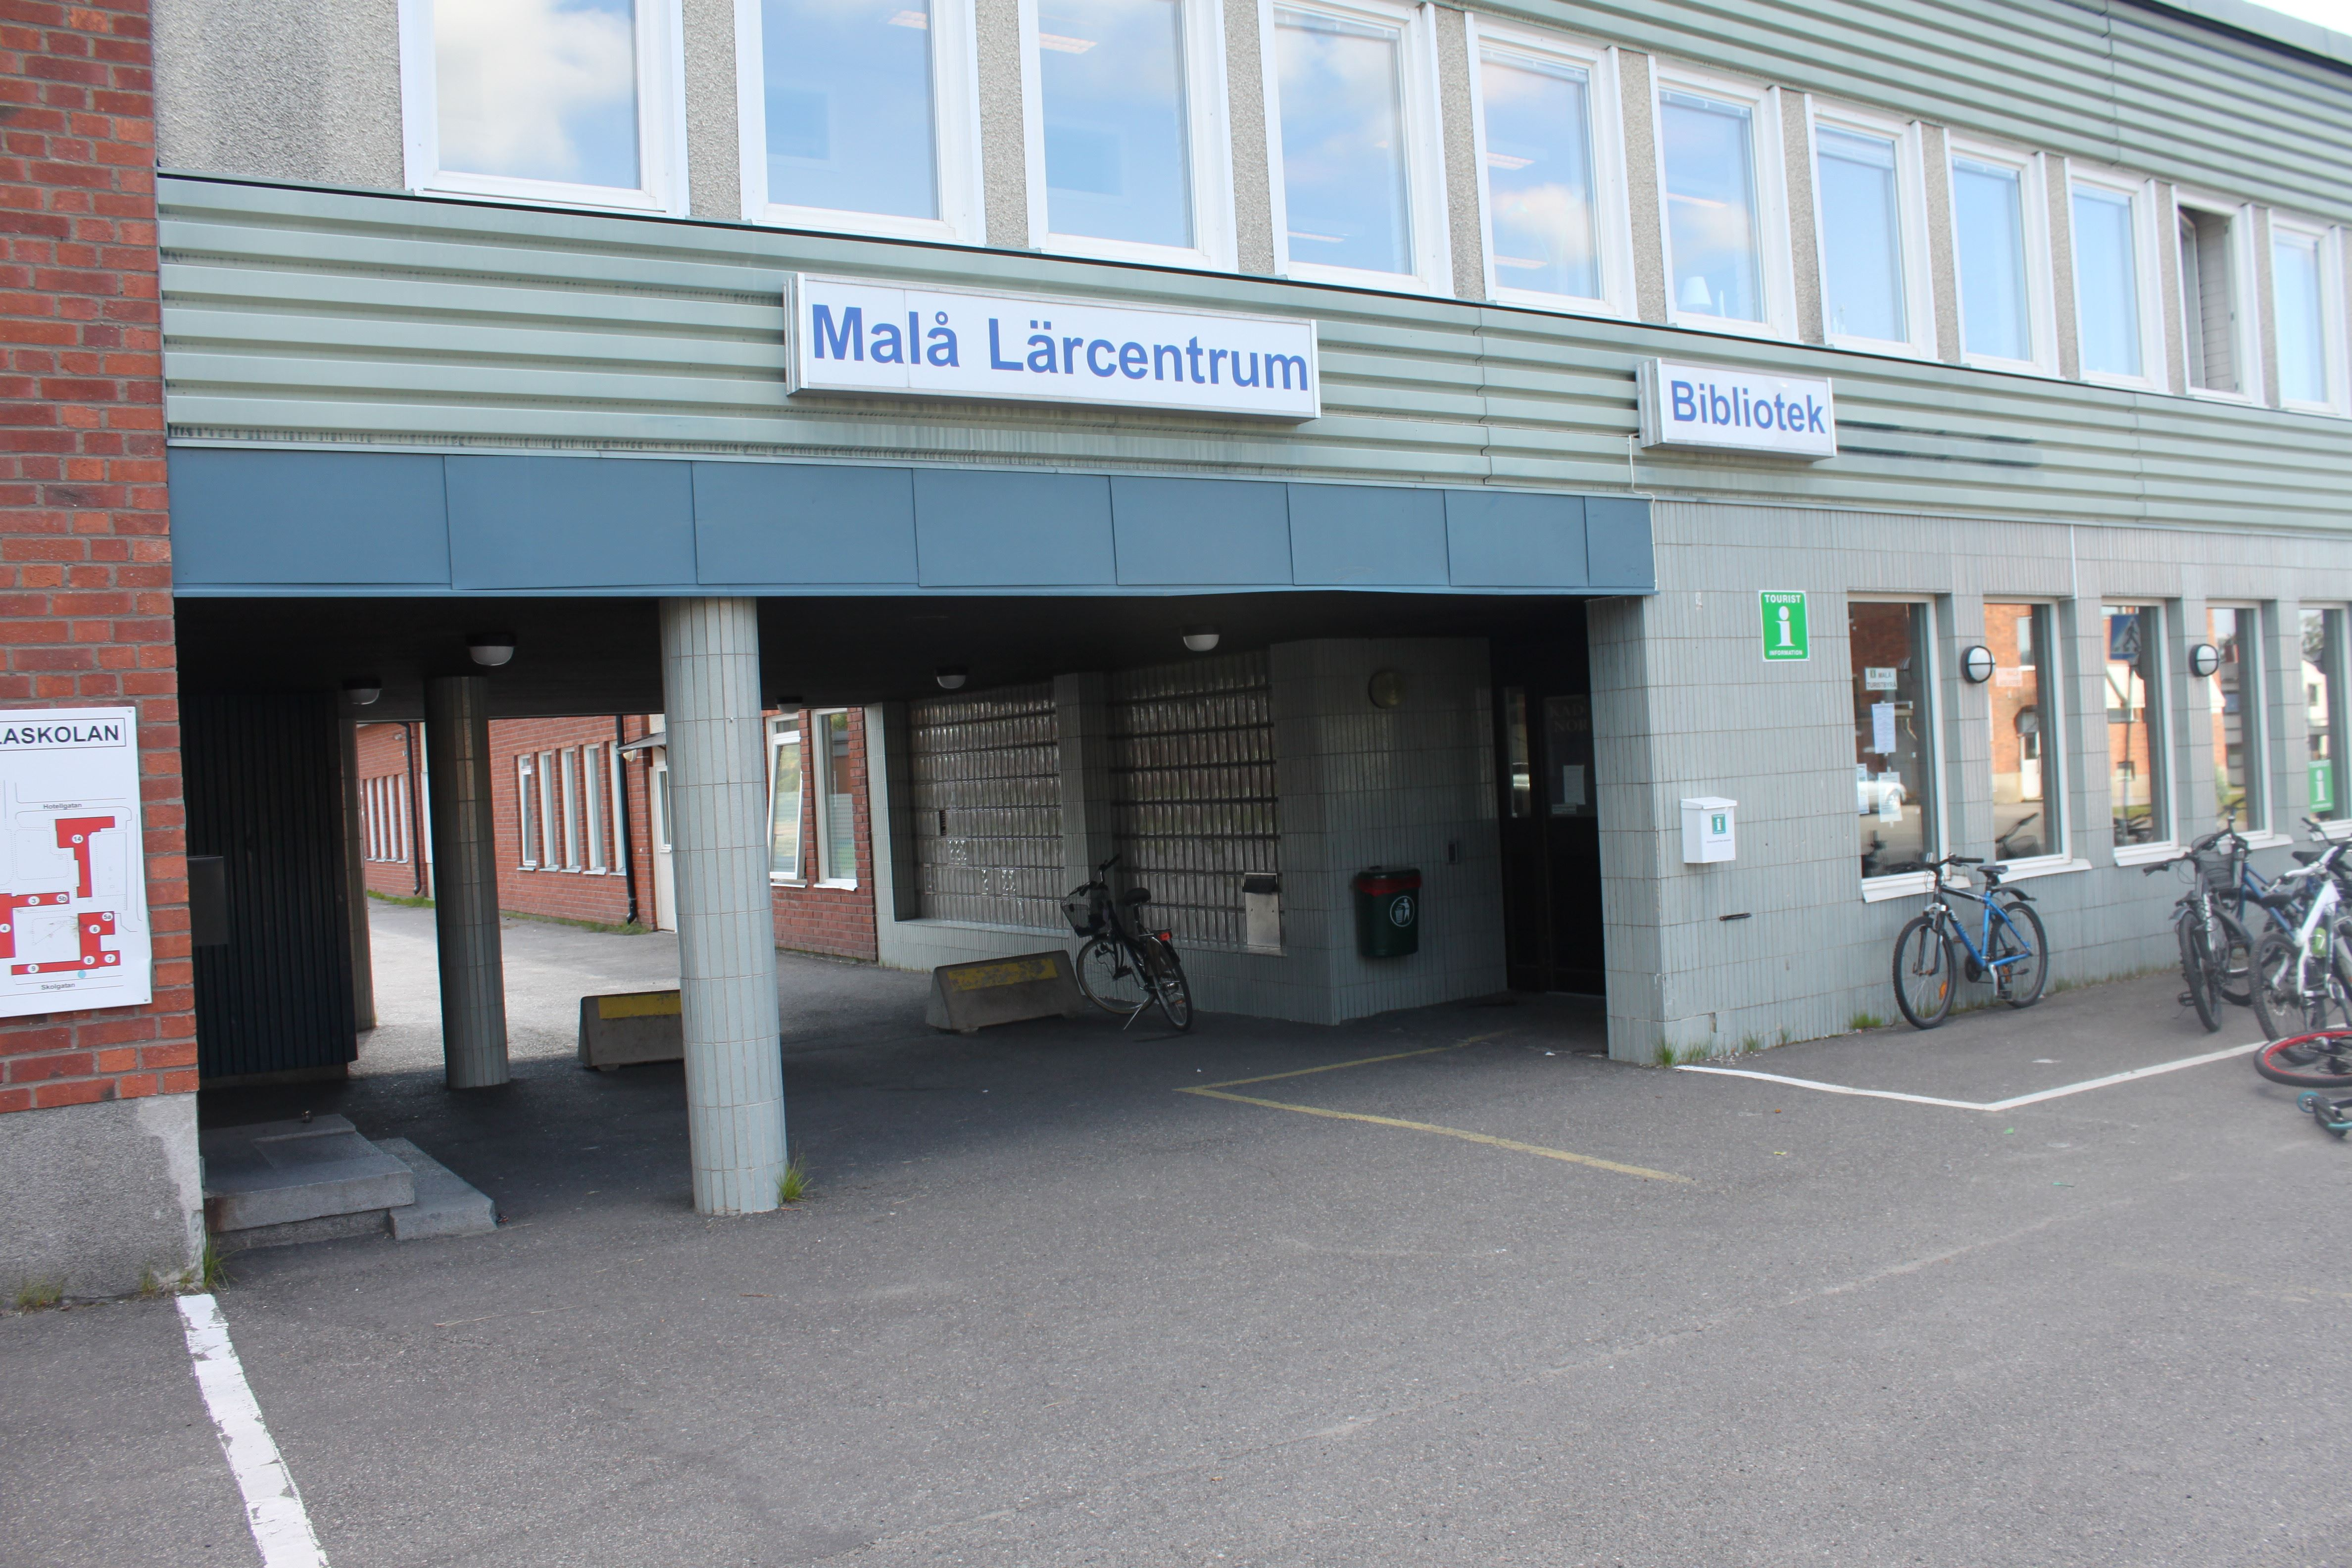 © Malå kommun, Bibliotek